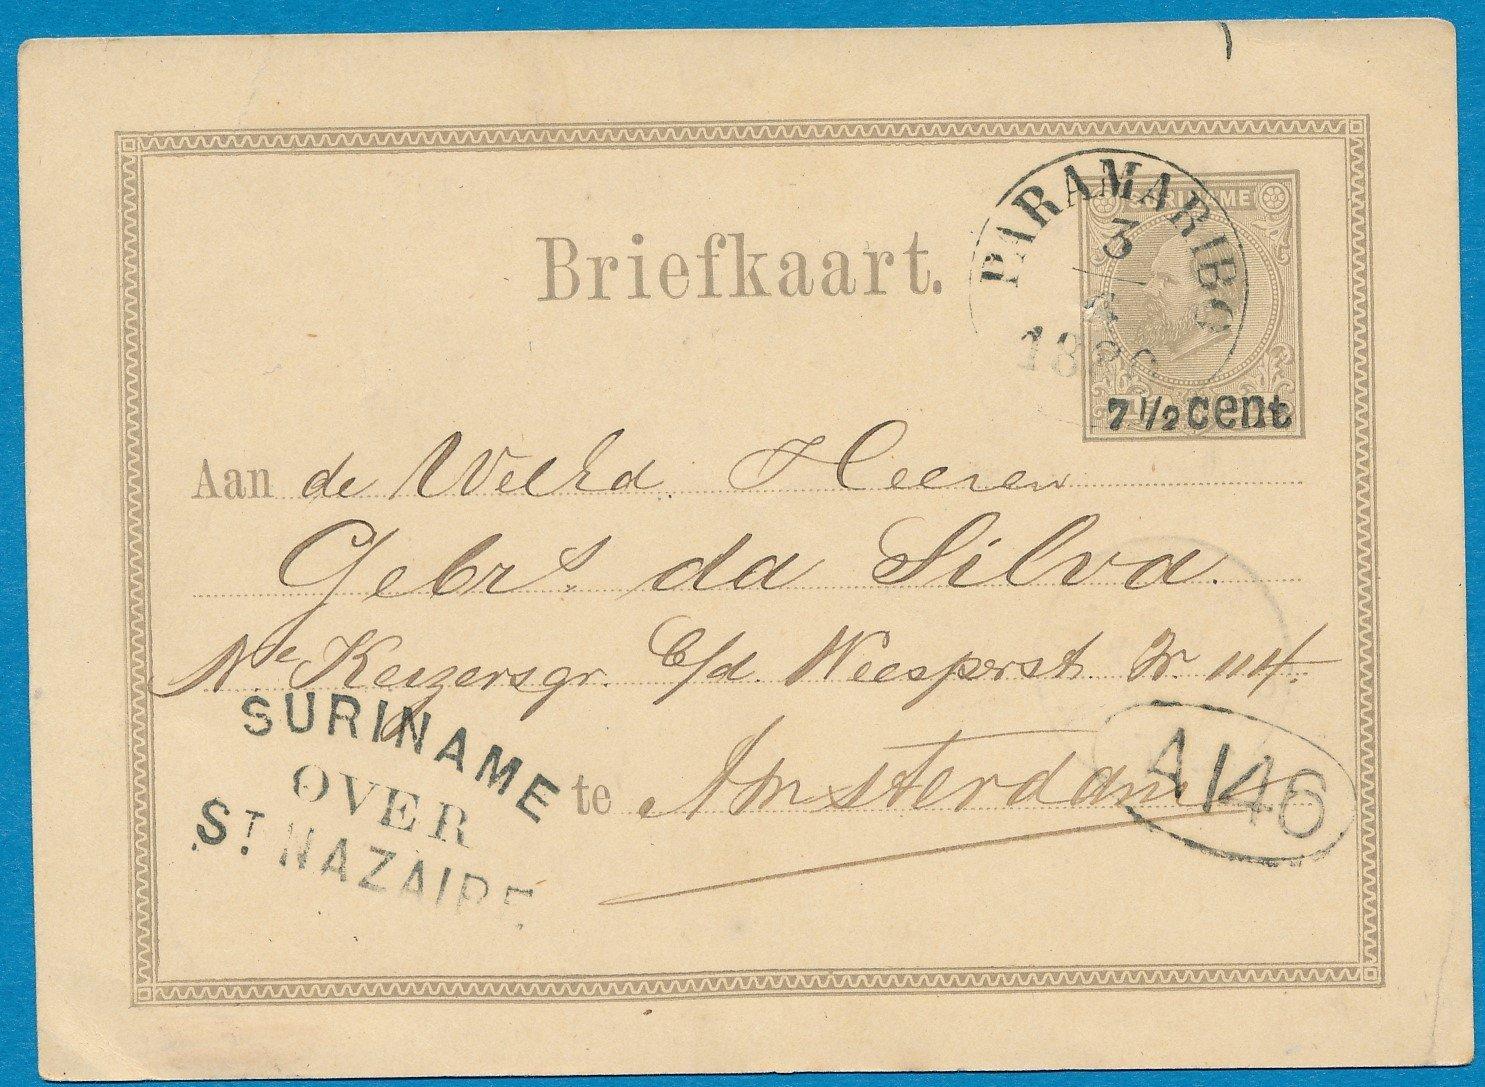 SURINAME briefkaart 1880 Paramaribo naar Amsterdam